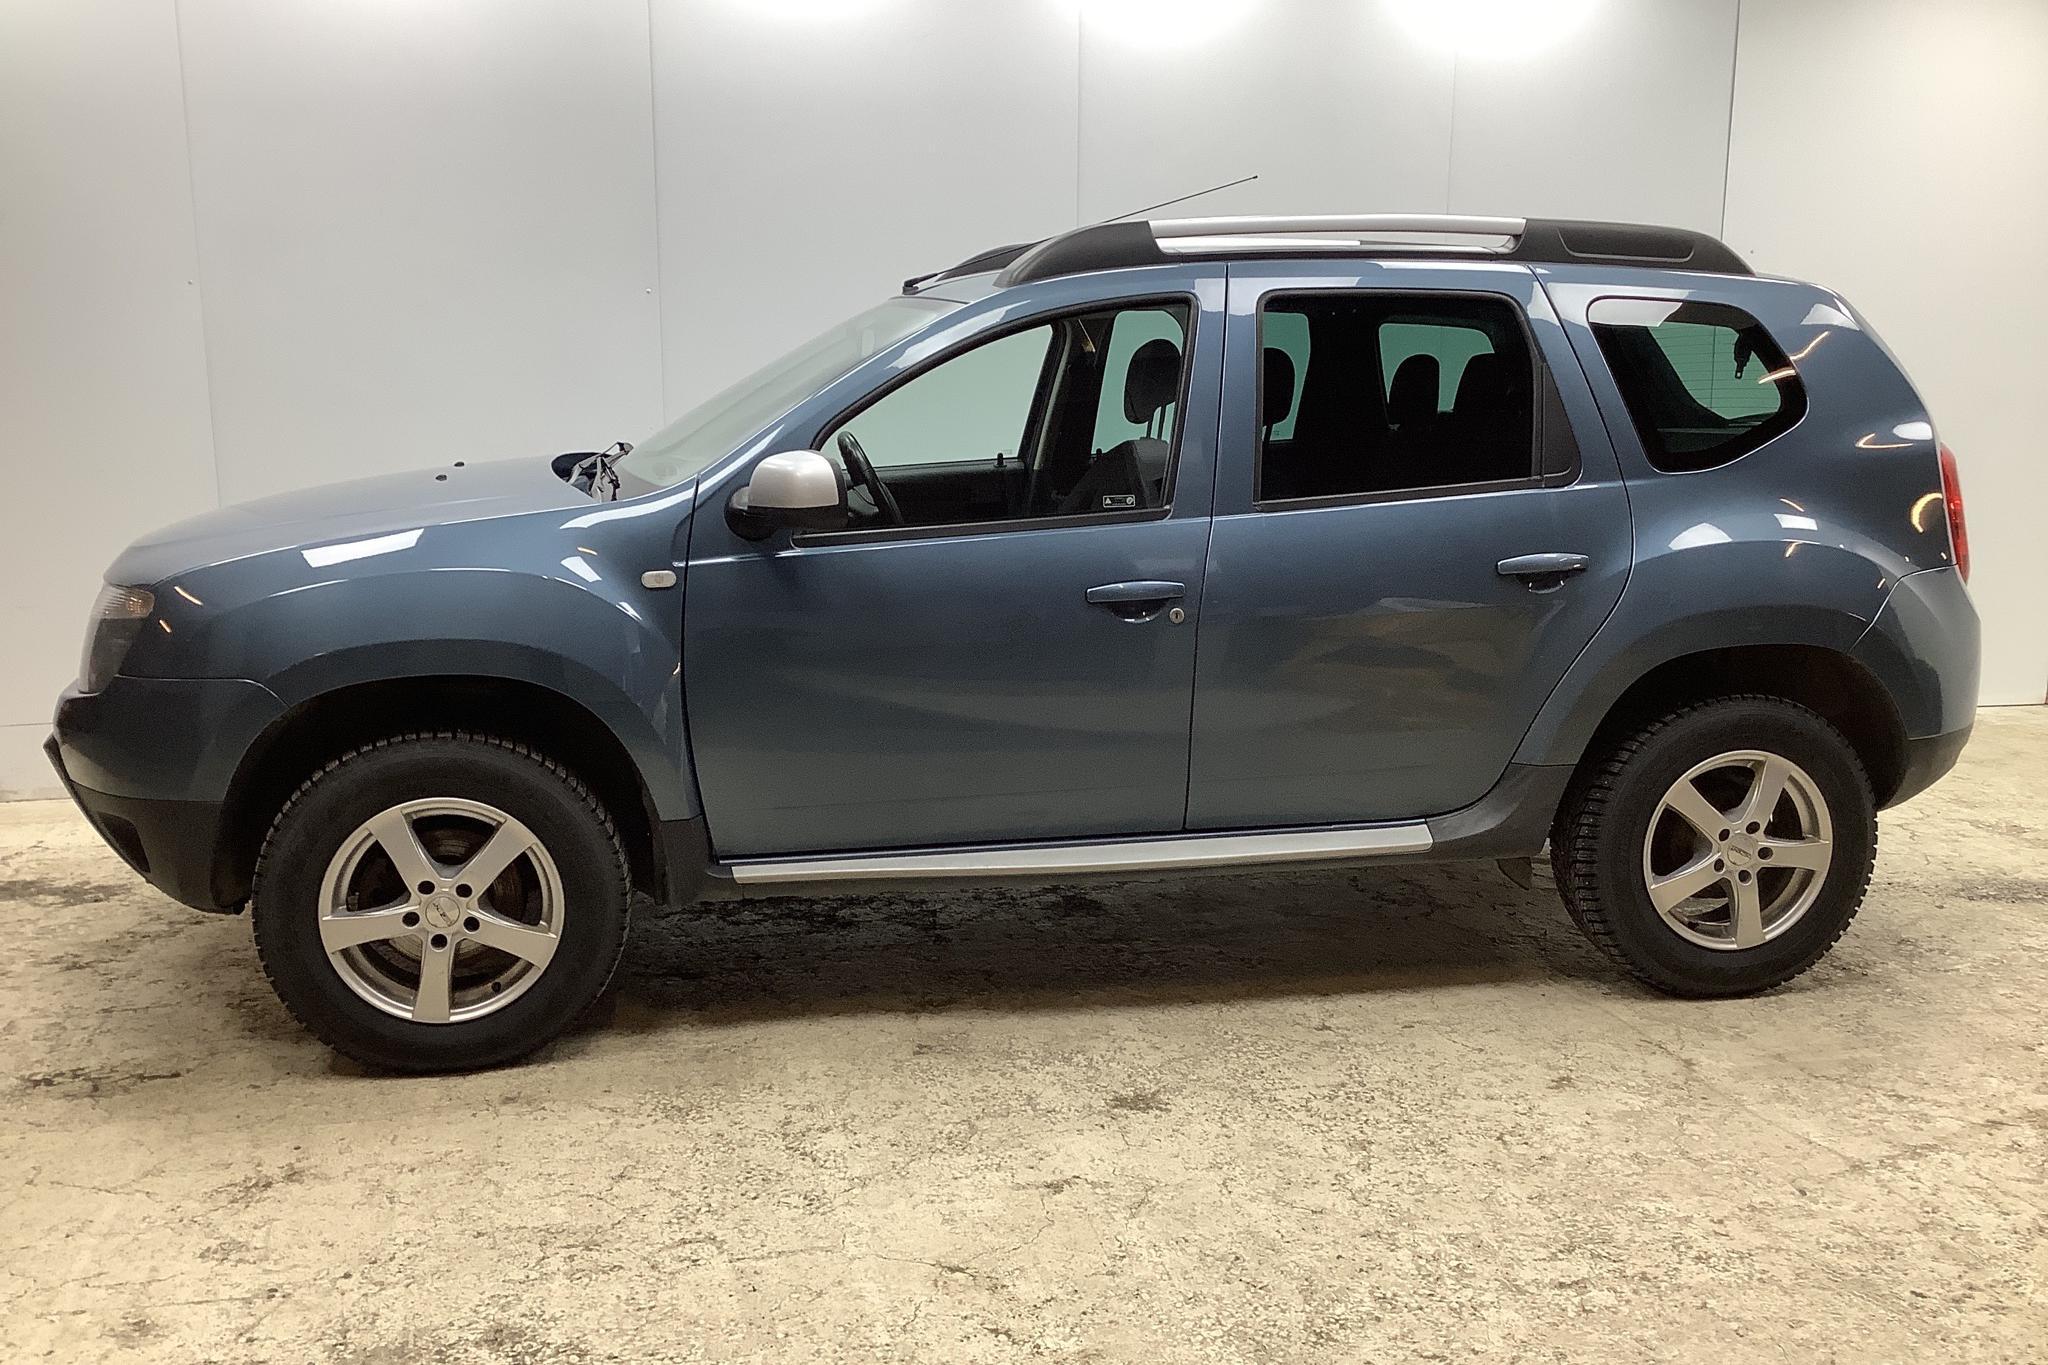 Dacia Duster 1.5 dCi 4x4 (109hk) - 13 373 mil - Manuell - blå - 2012